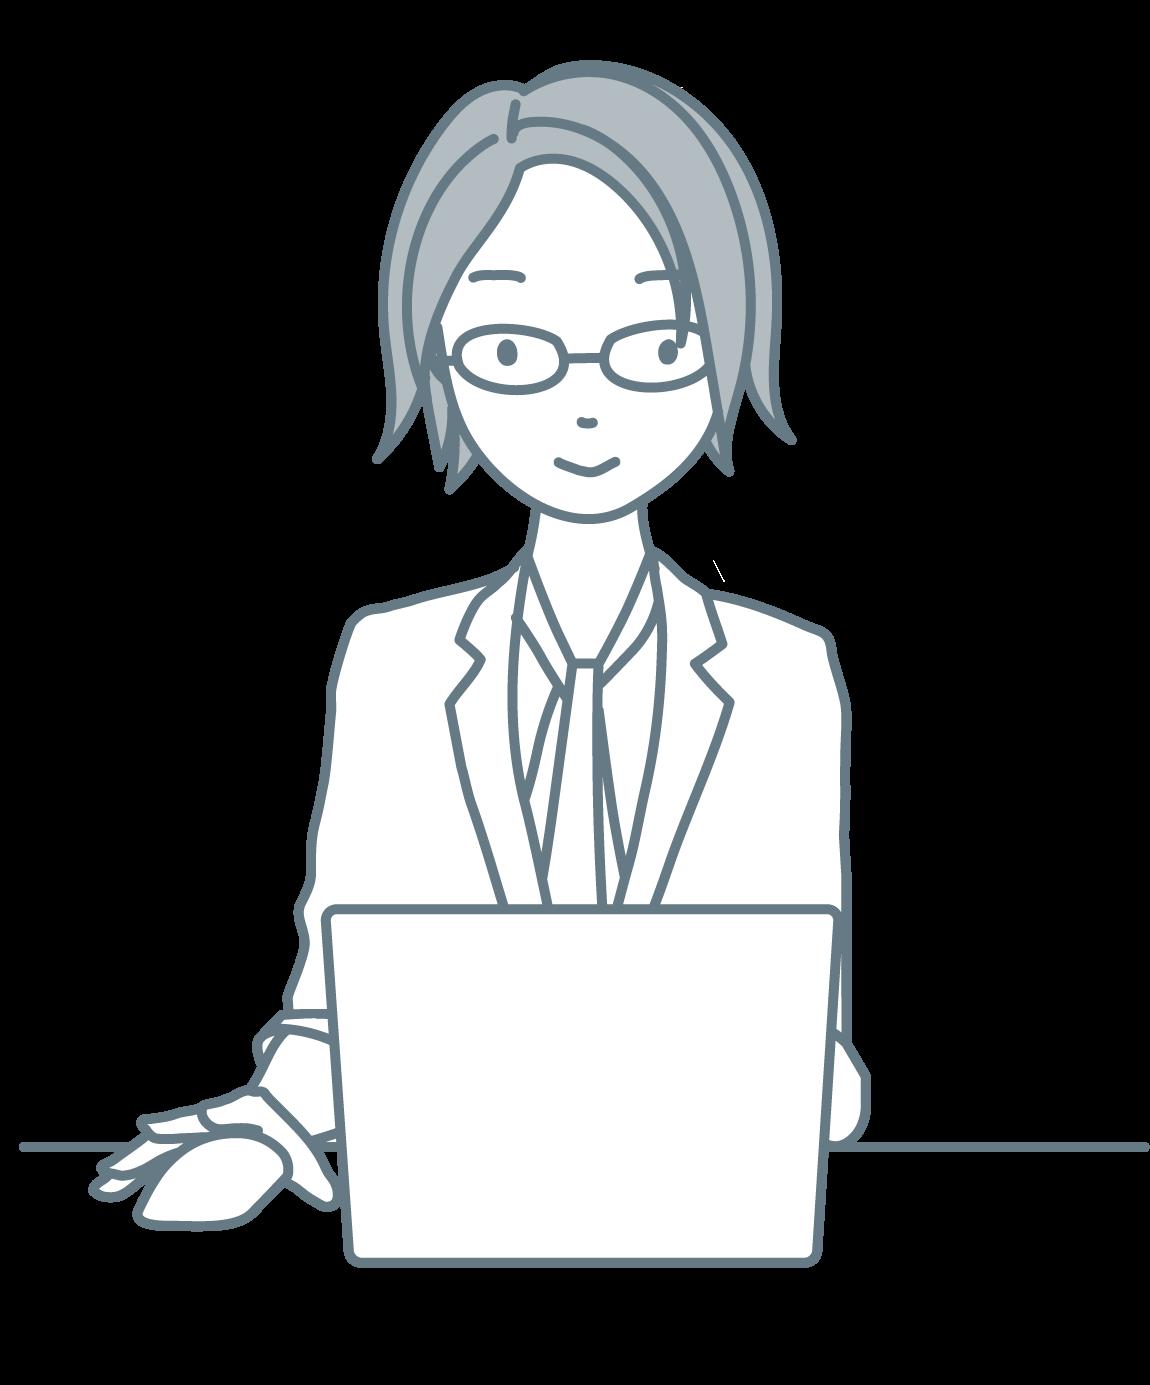 contrfinder-illustration__people-attorney